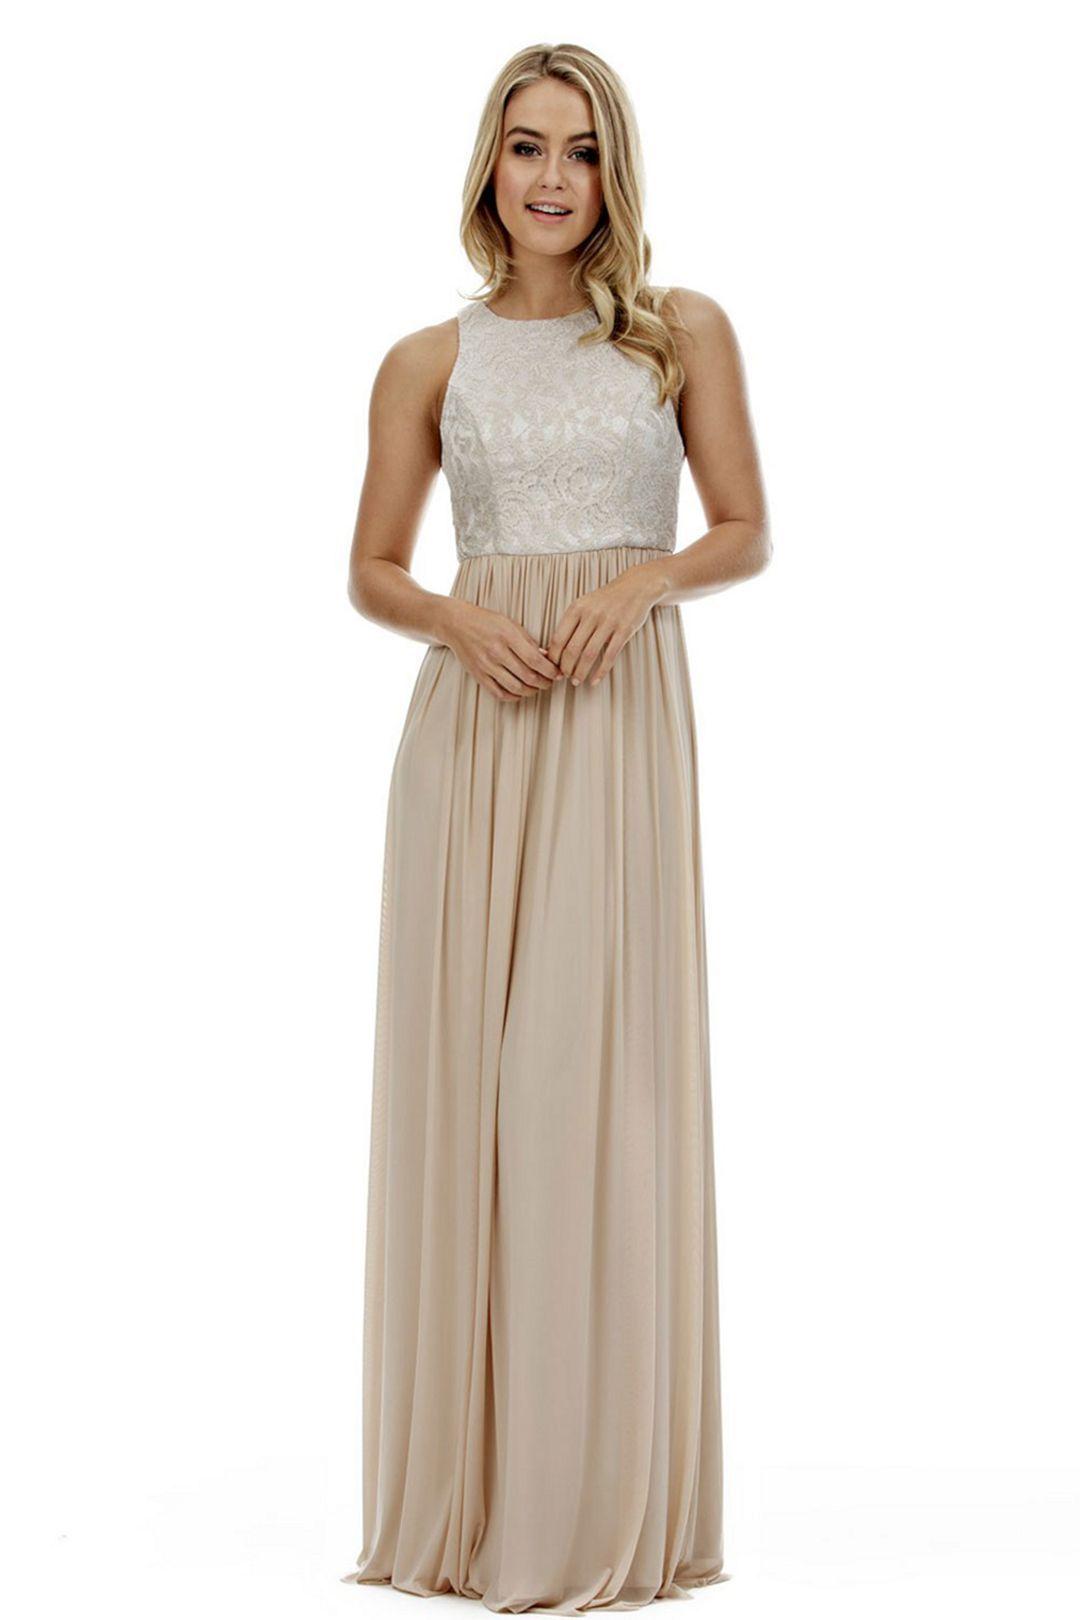 After wedding dress ideas   Brilliant Gold Long Wedding Dresses For Bridesmaid Ideas